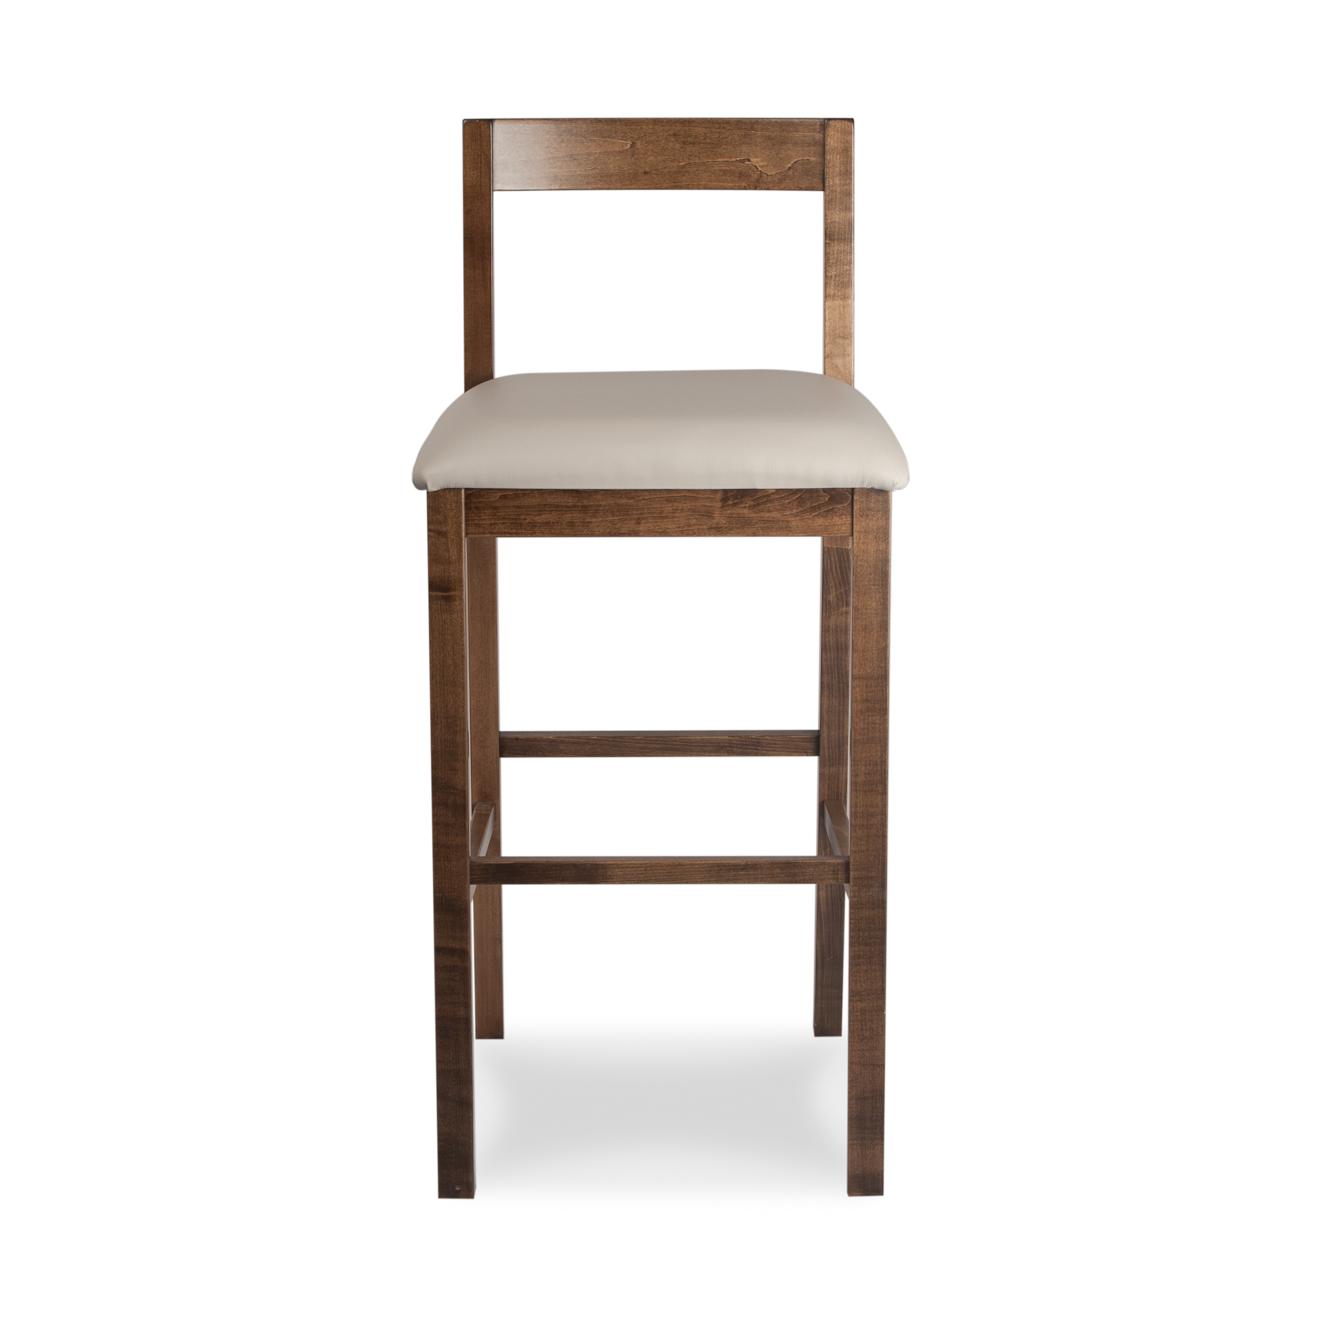 004_Woodcraft_Furniture_AnthonyBarstool_Front-3.jpg